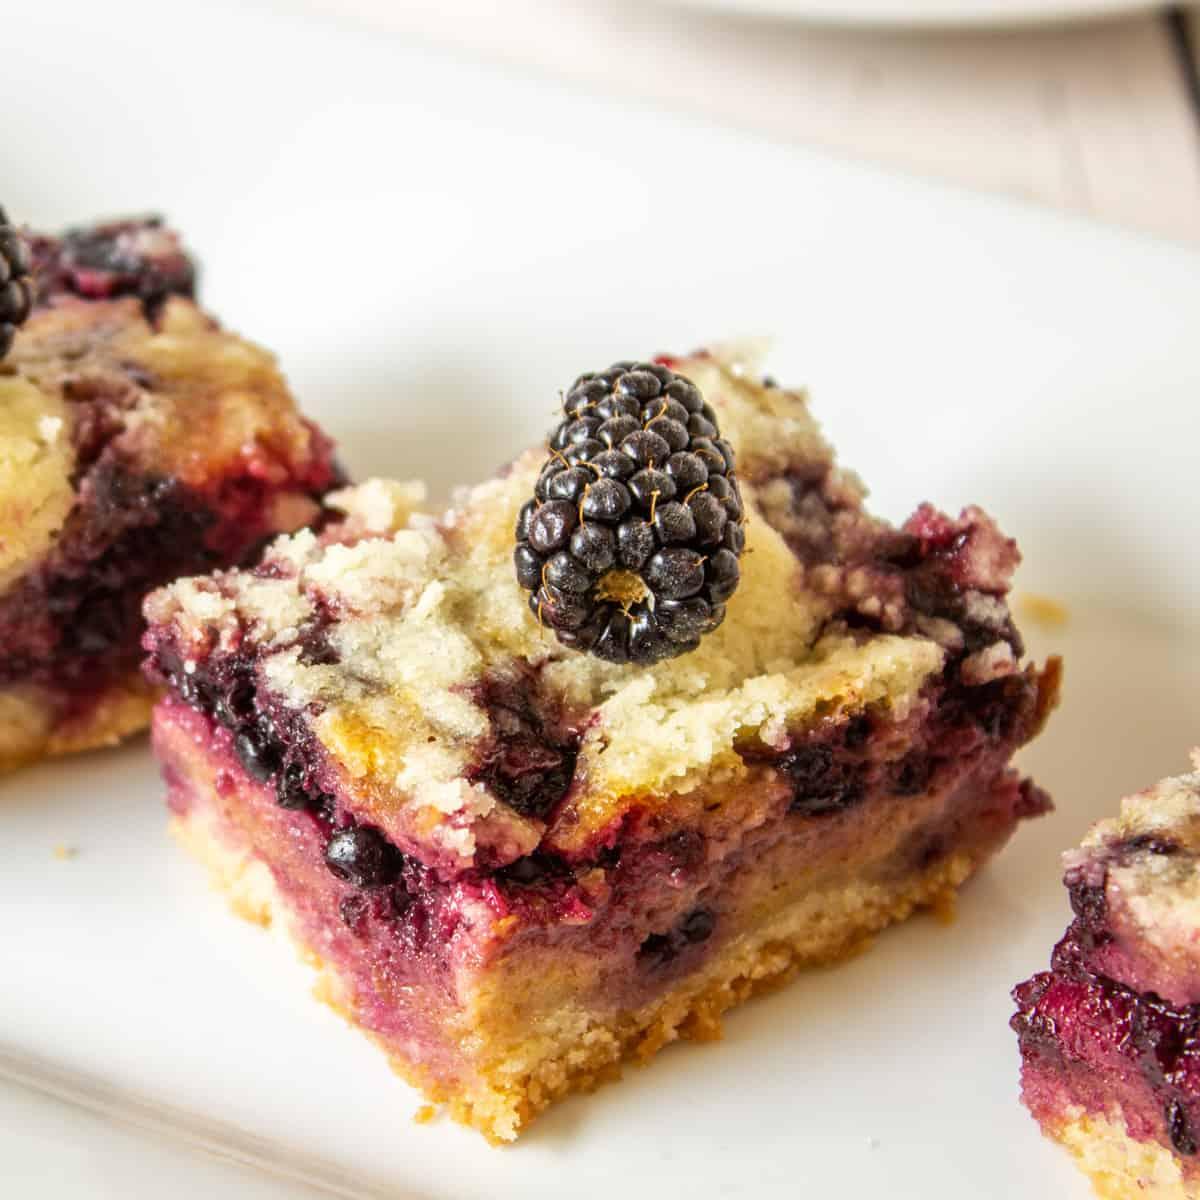 A dessert bar filled with blackberries.